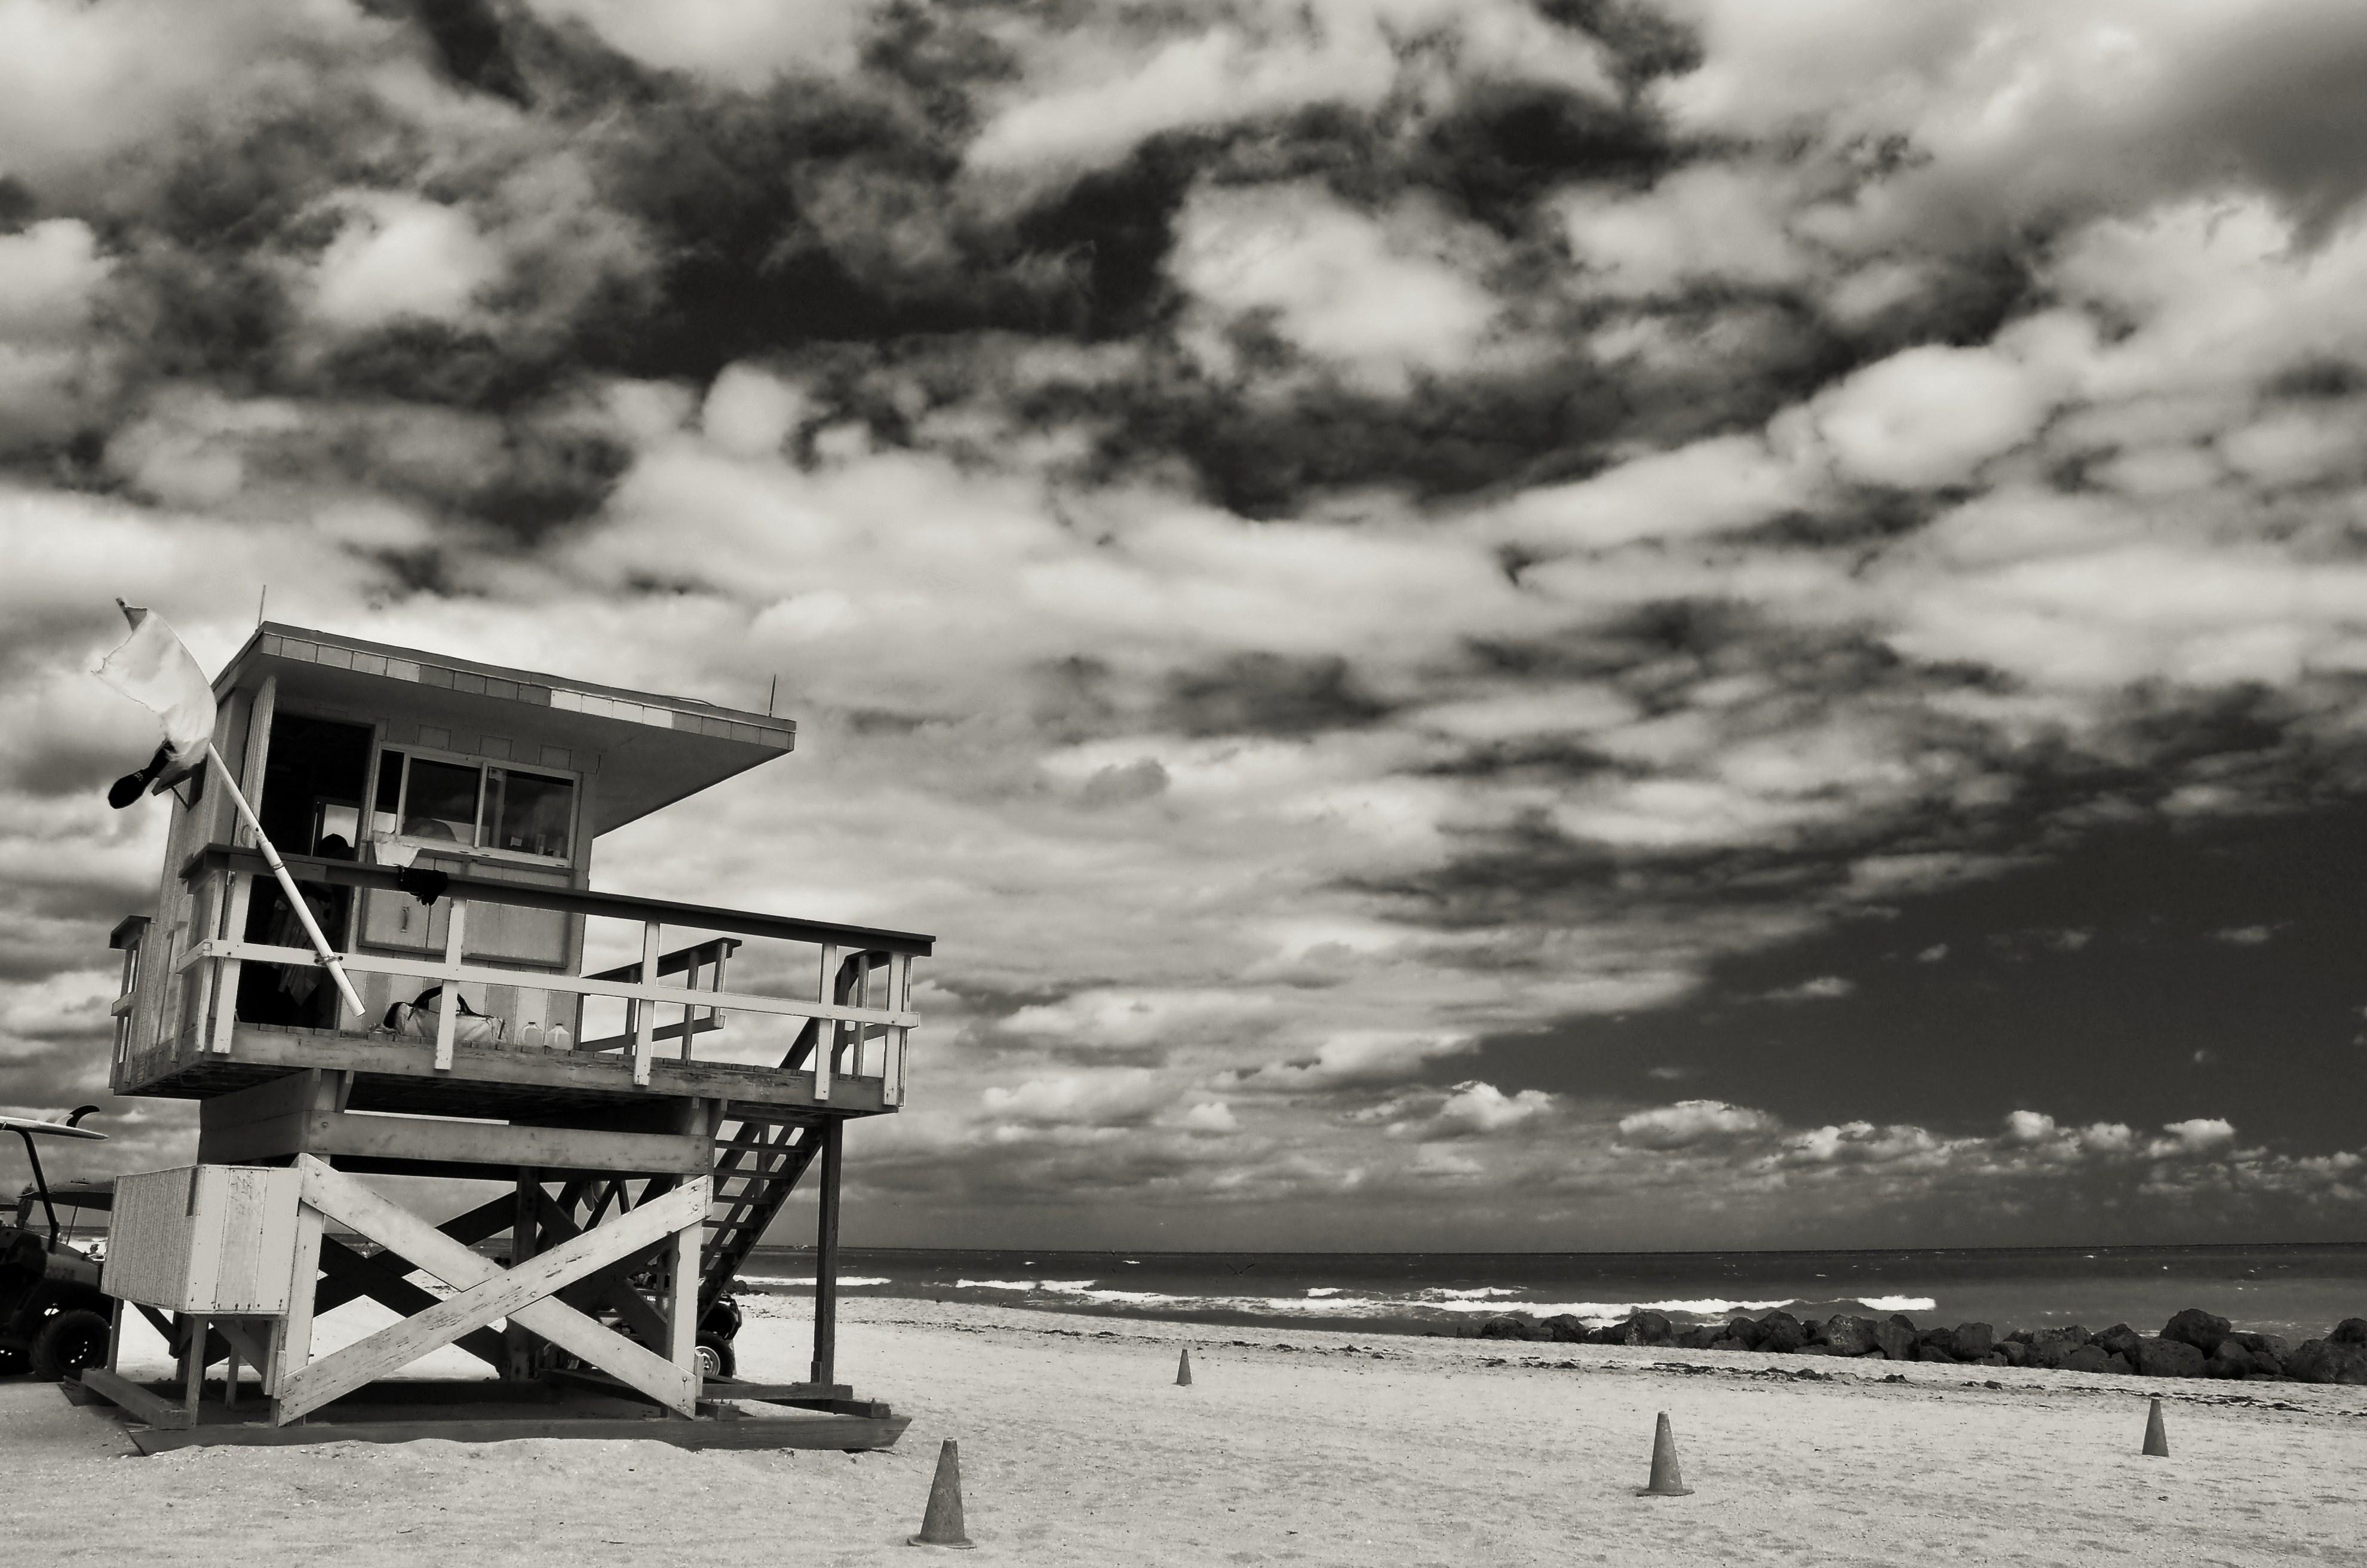 Elevation of Sandfly Ln, Vero Beach, FL, USA - Topographic